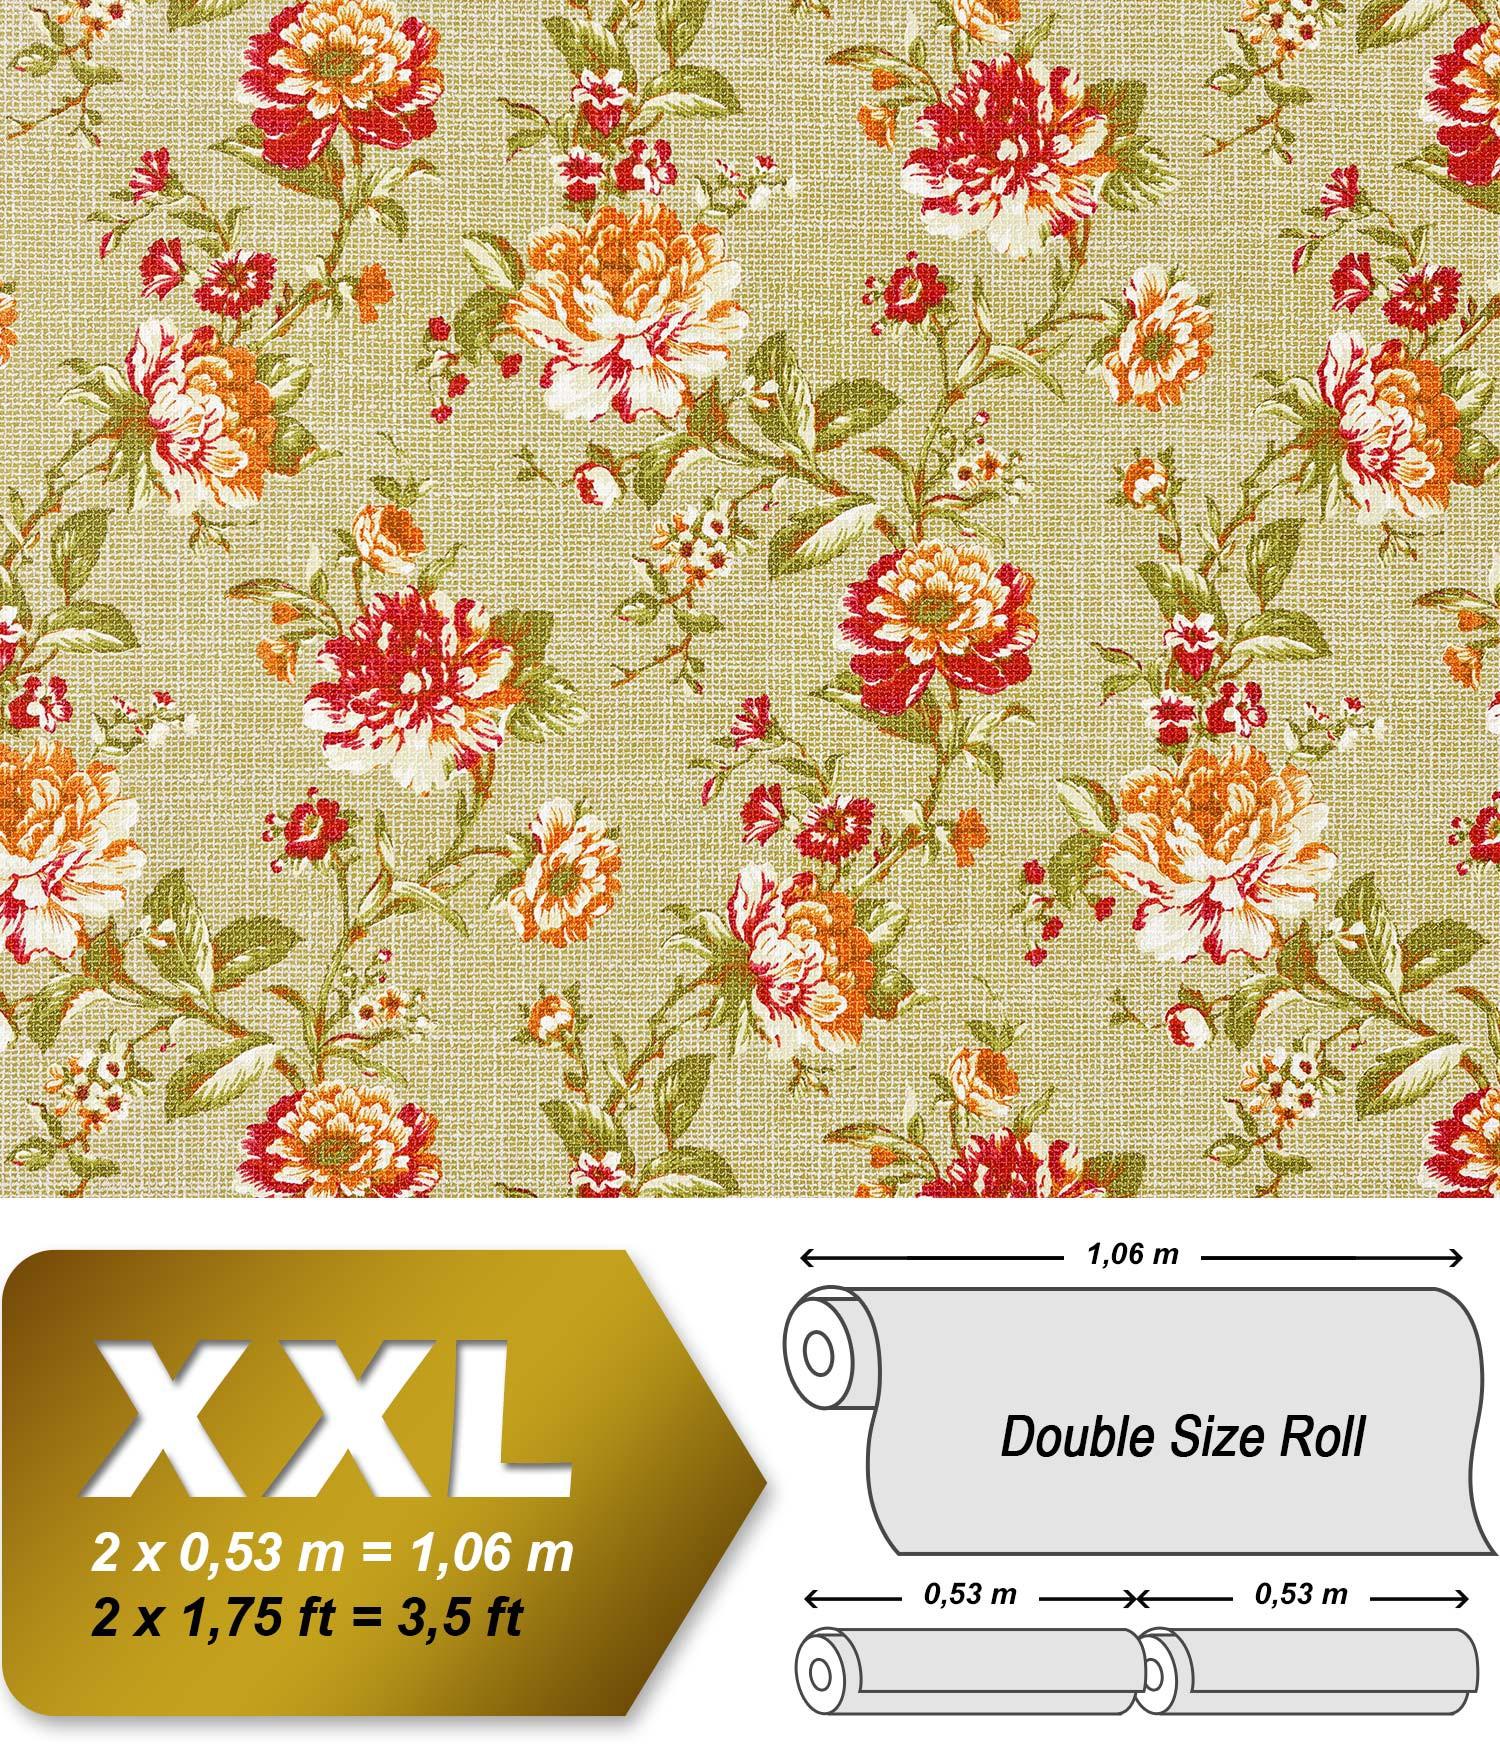 edem 603 95 vliestapete xxl florales muster blumen gr n rot orange 10 65 qm. Black Bedroom Furniture Sets. Home Design Ideas